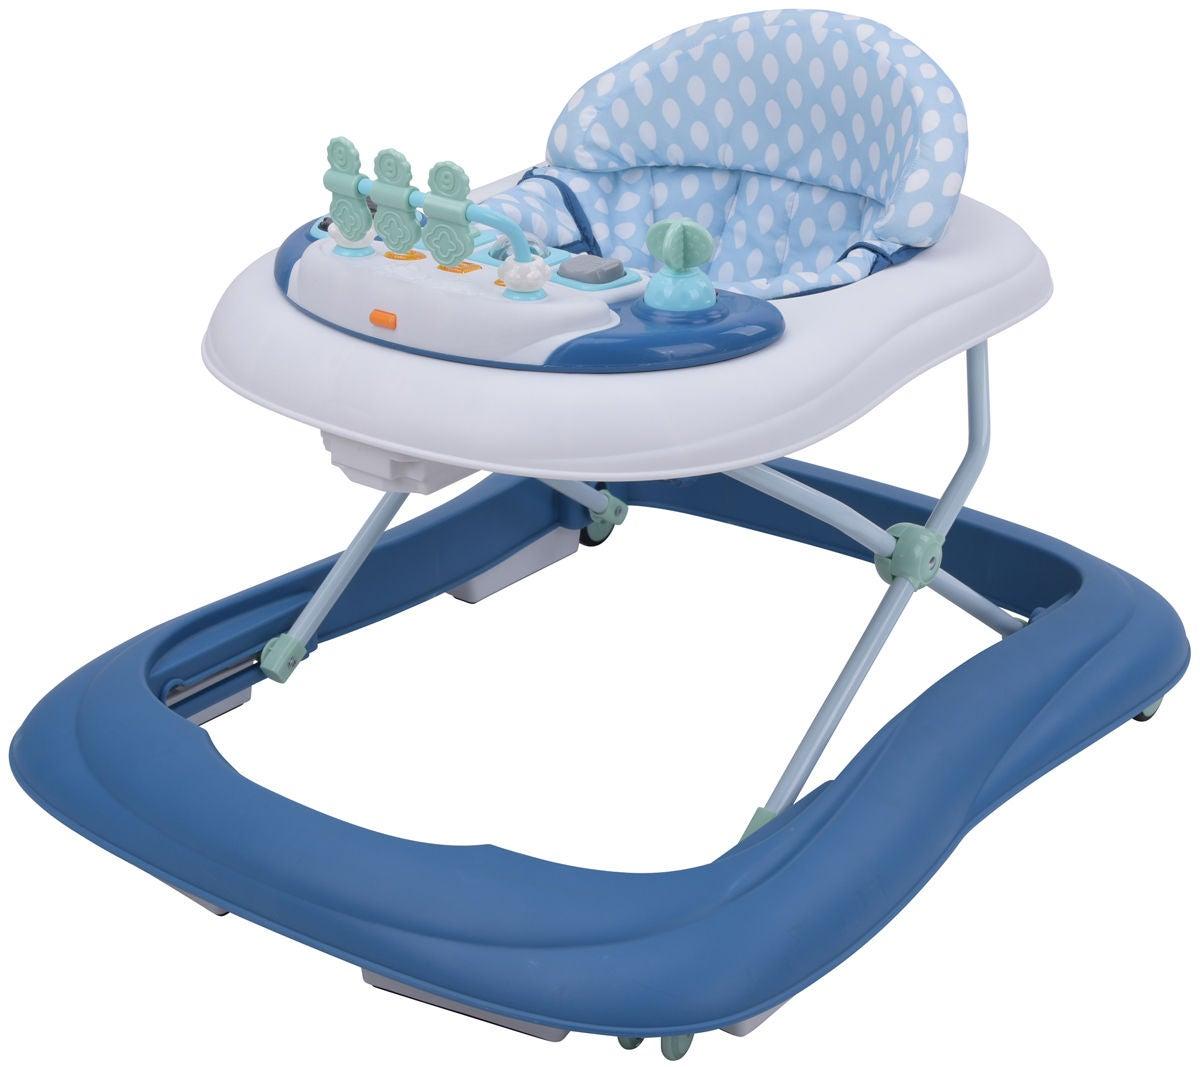 BabyDan Kävelytuoli, Blue